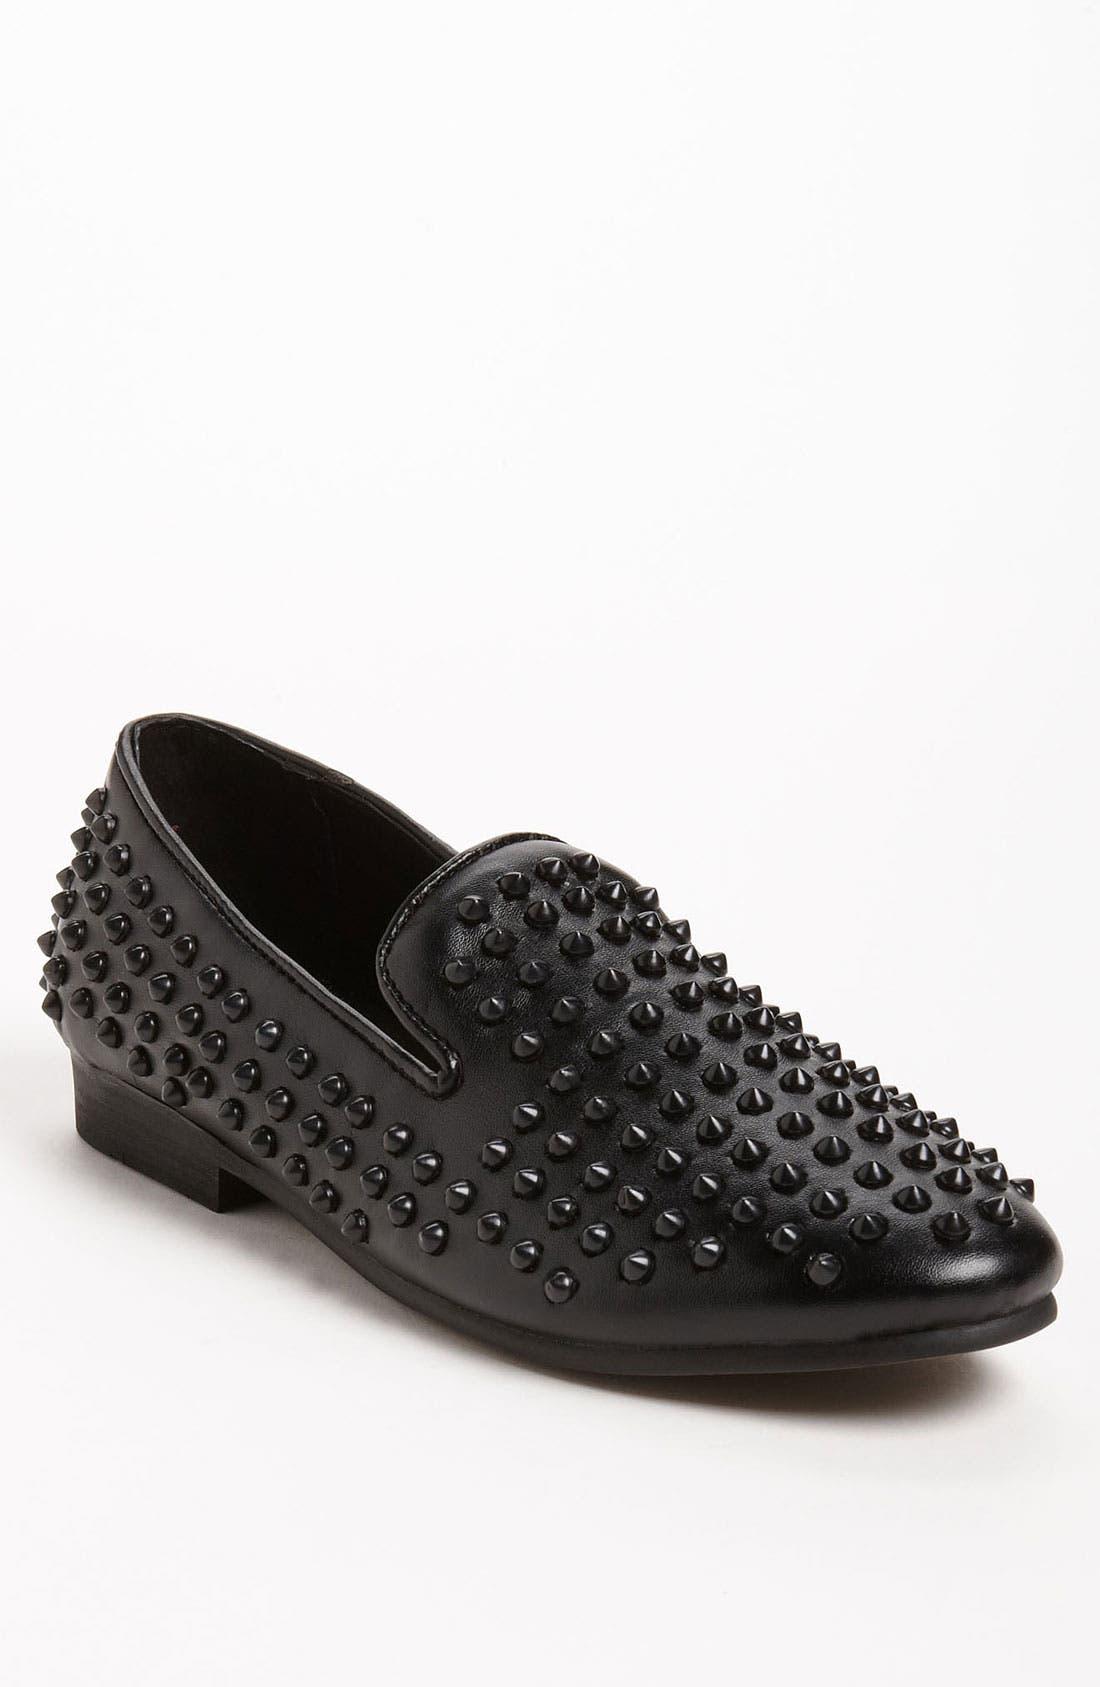 Main Image - Steve Madden 'Jagggrr' Studded Loafer